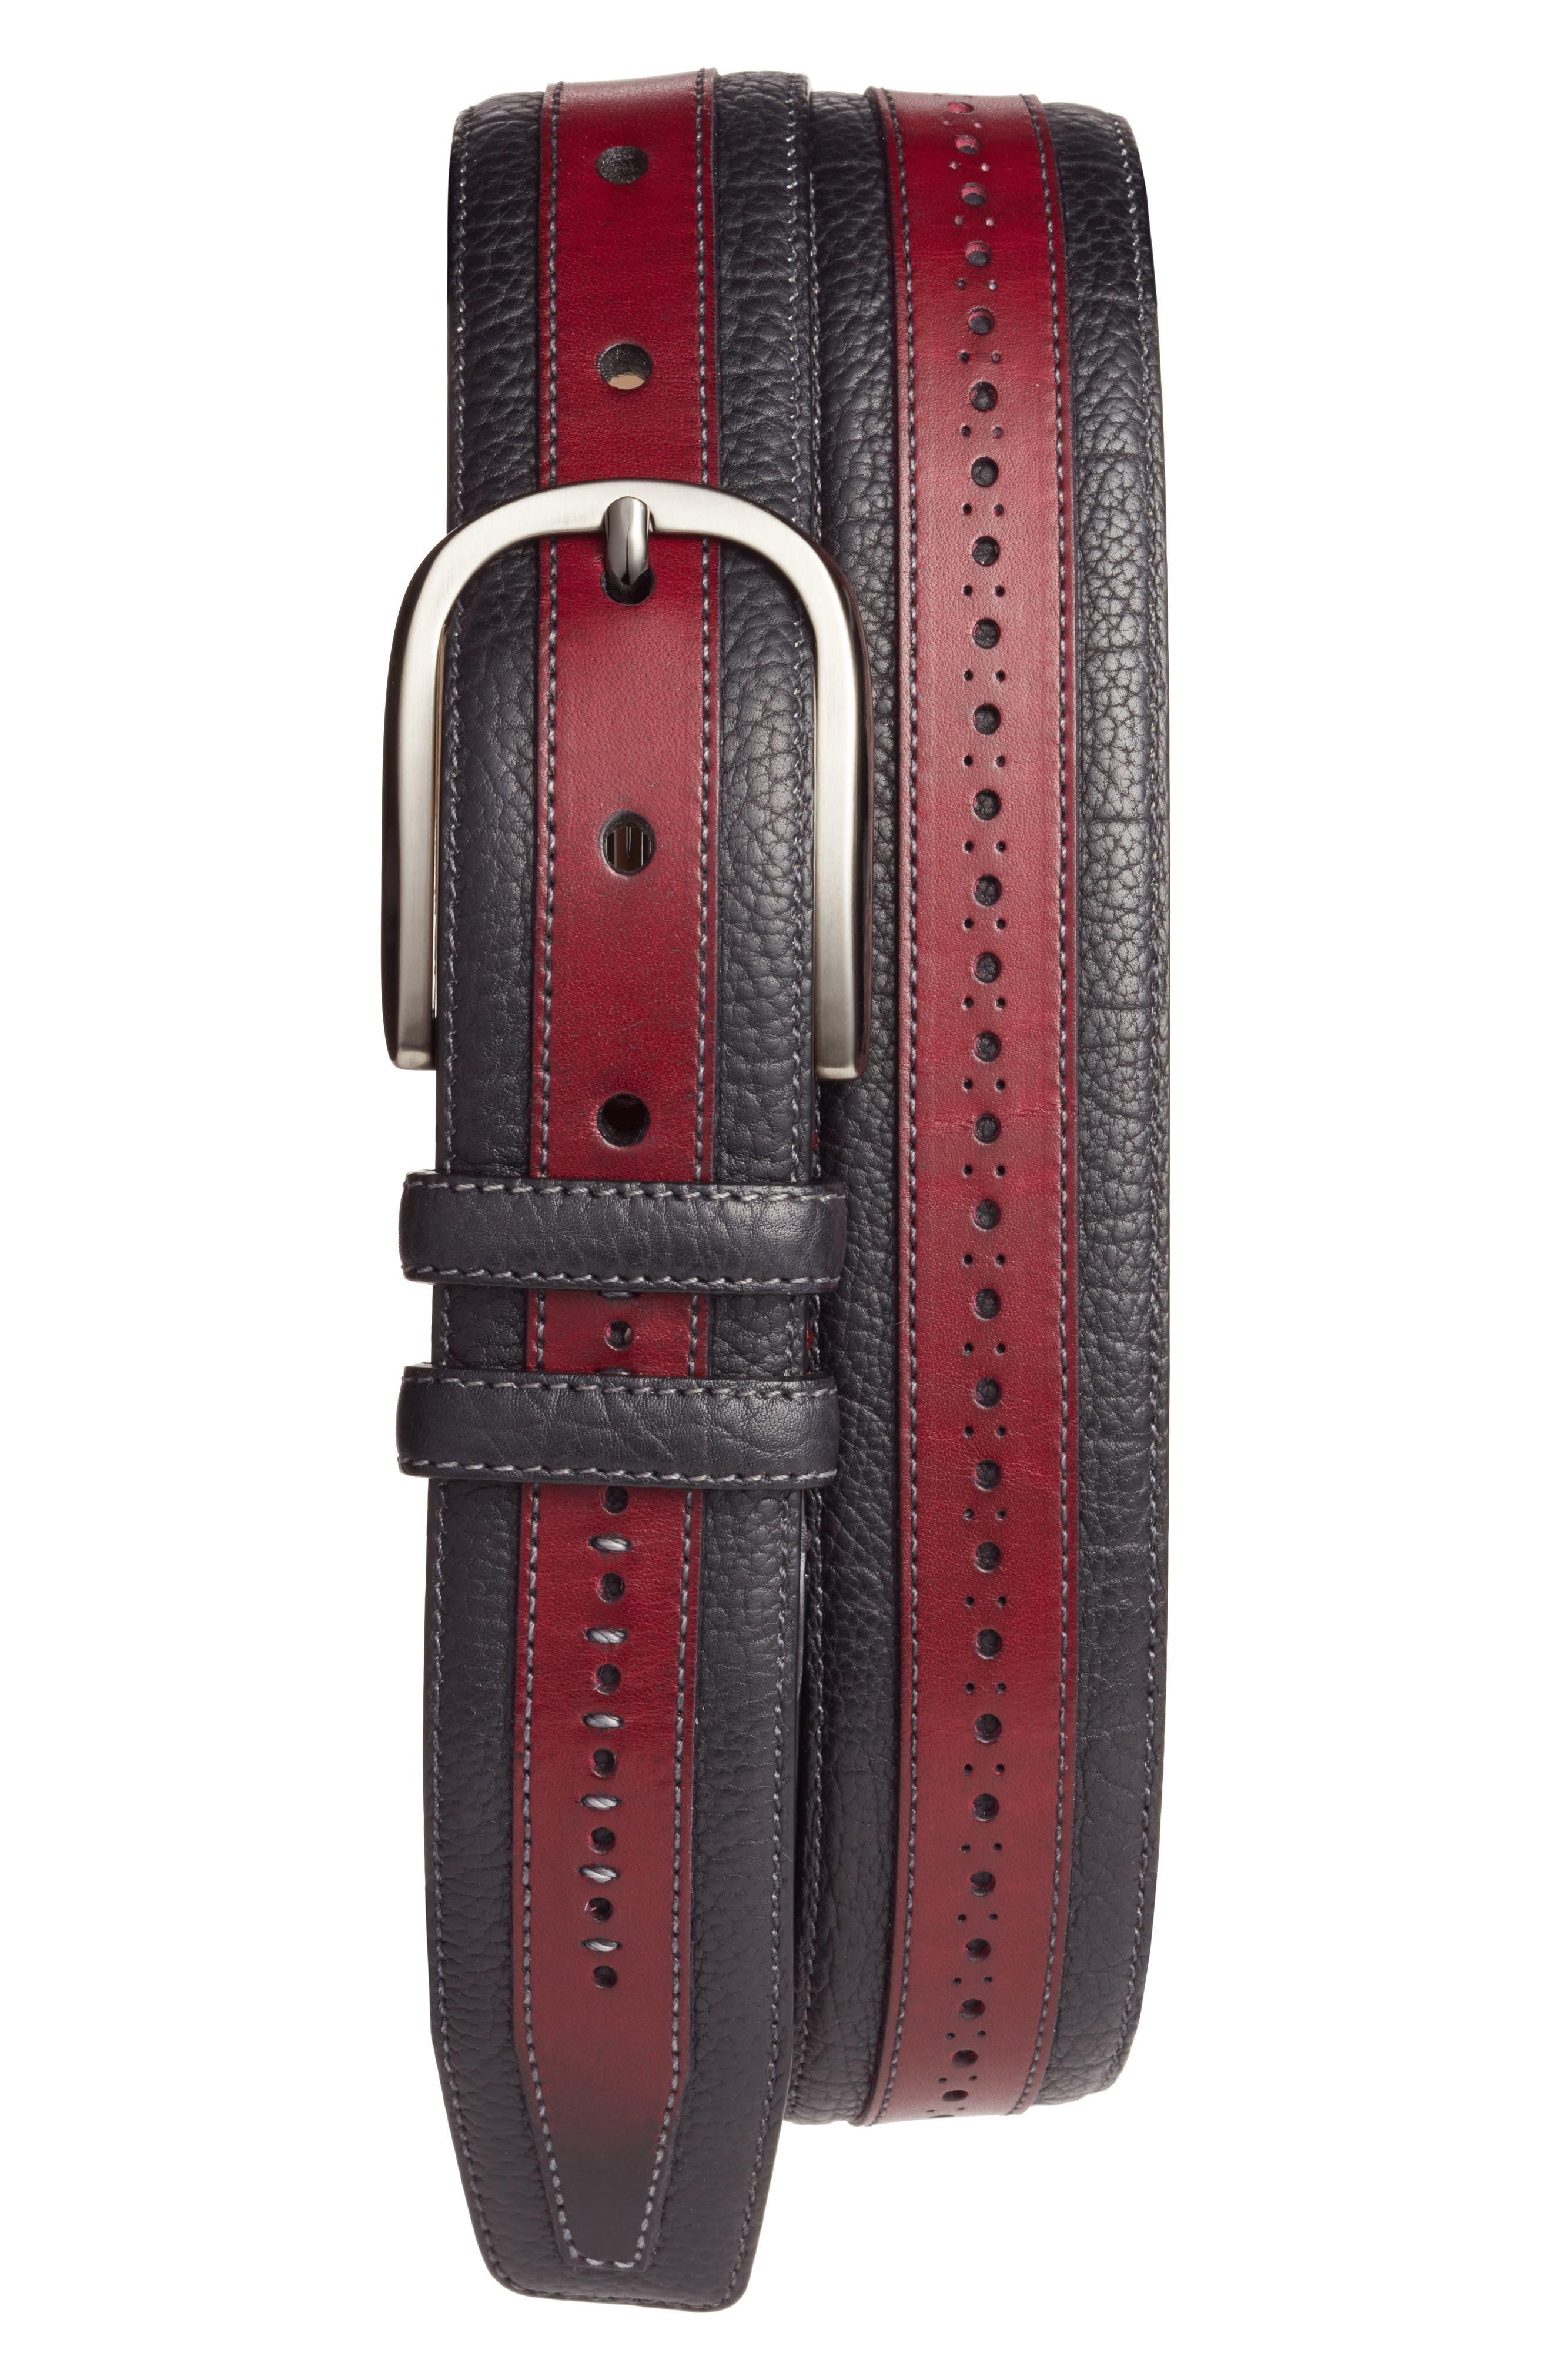 Palma Leather Belt,                             Main thumbnail 1, color,                             Burgundy/ Black